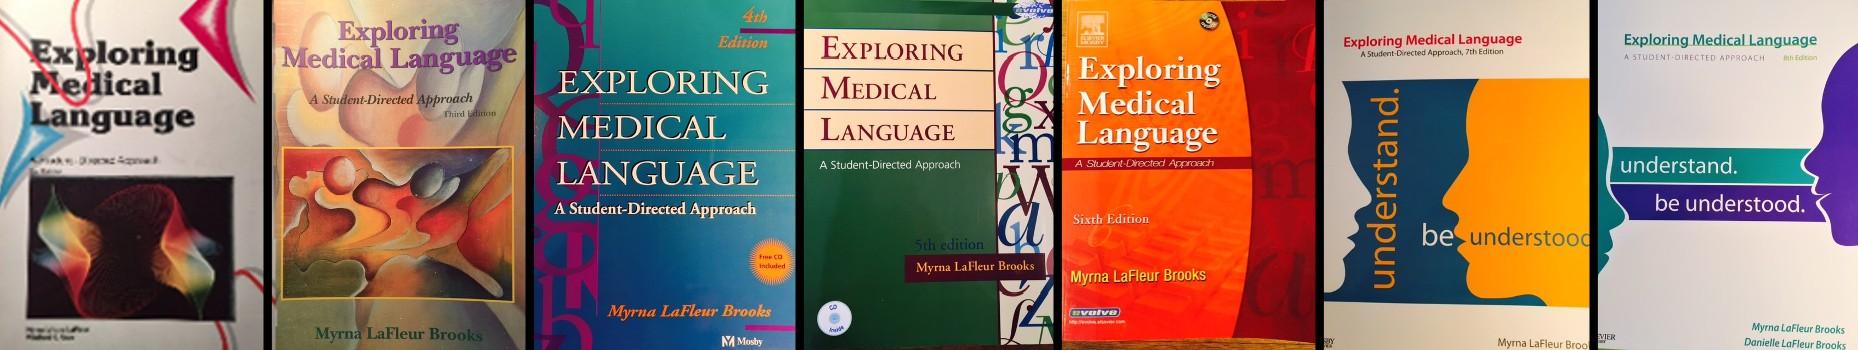 Exploring Medical Language Medical Terminology Textbook